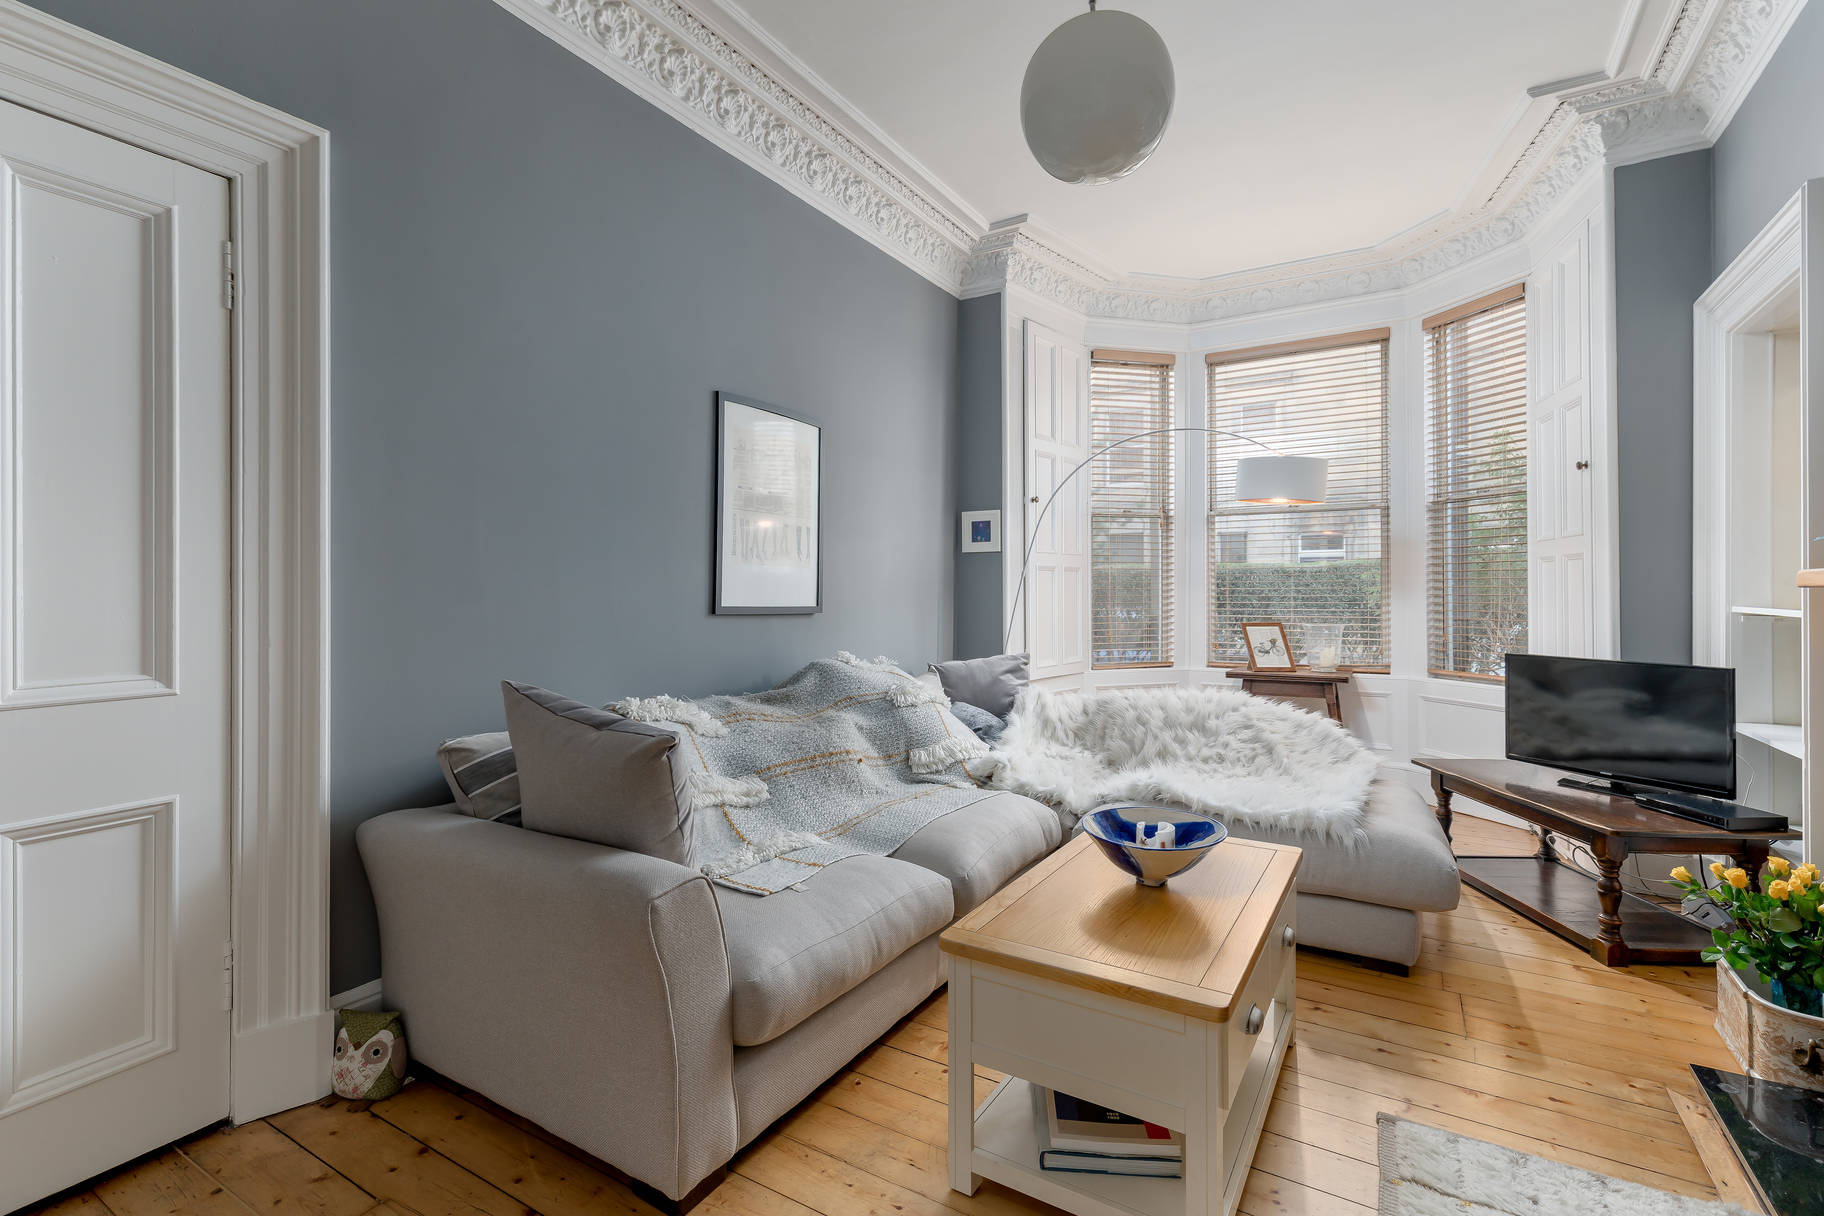 16 Royston Terrace, Inverleith, Edinburgh, EH3 5QS